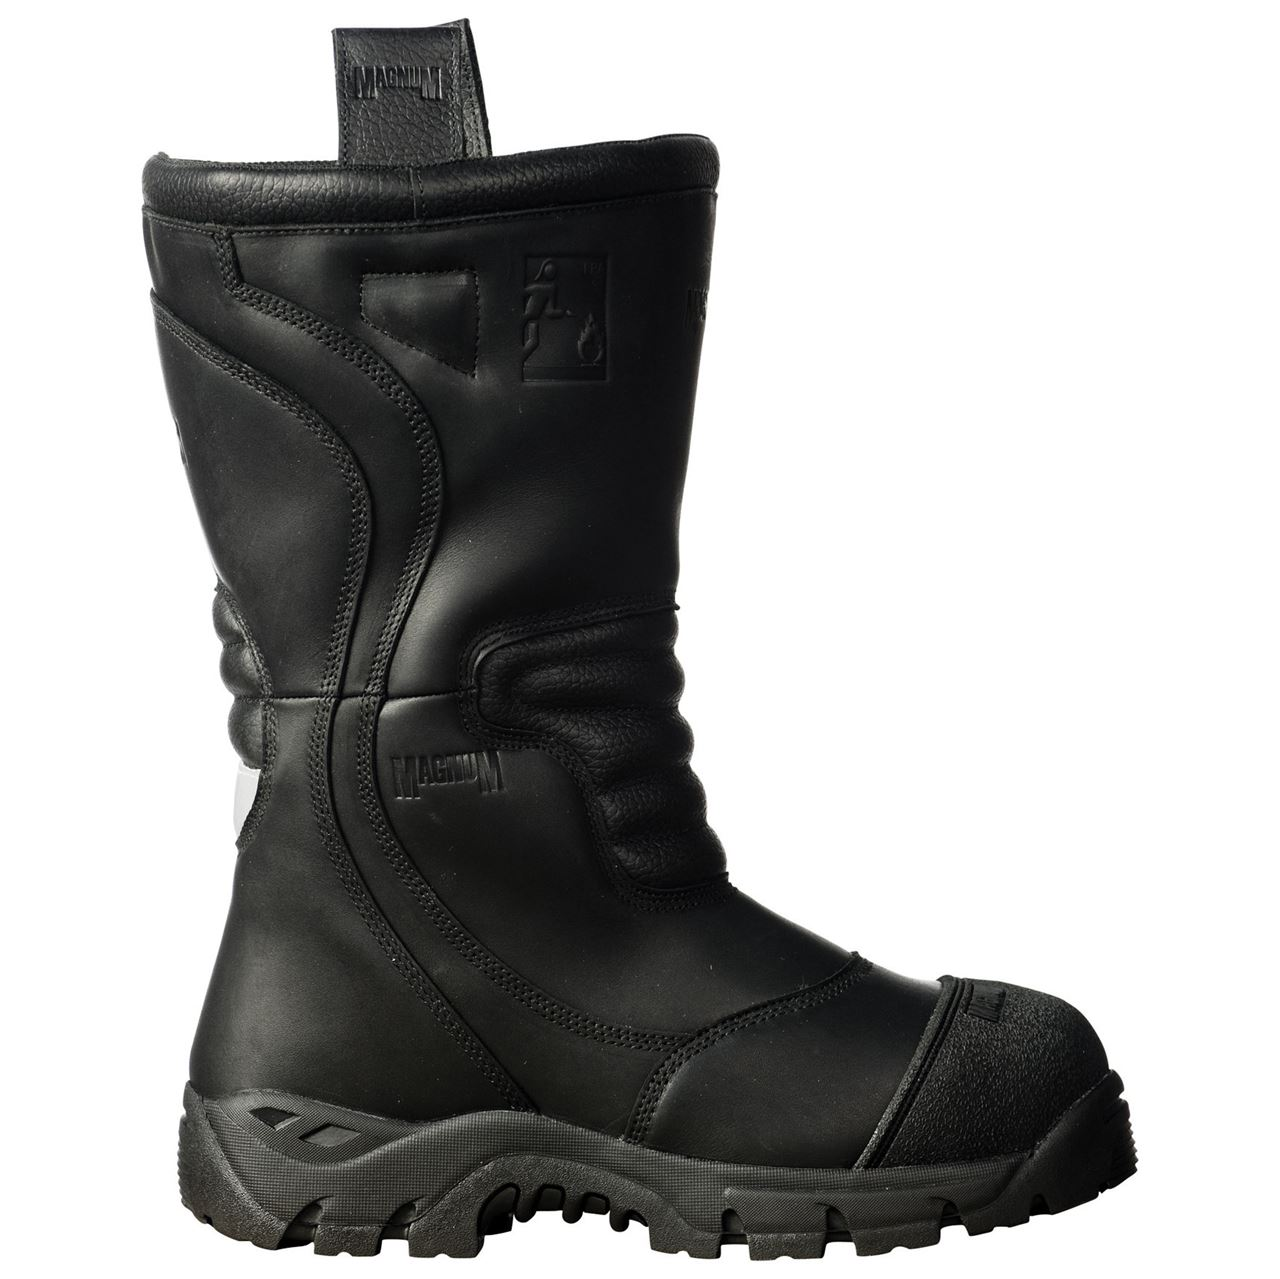 86d1d34ac65215 Magnum Pro Bunker Fireman Unisex Boot with Fire Retardant Leather